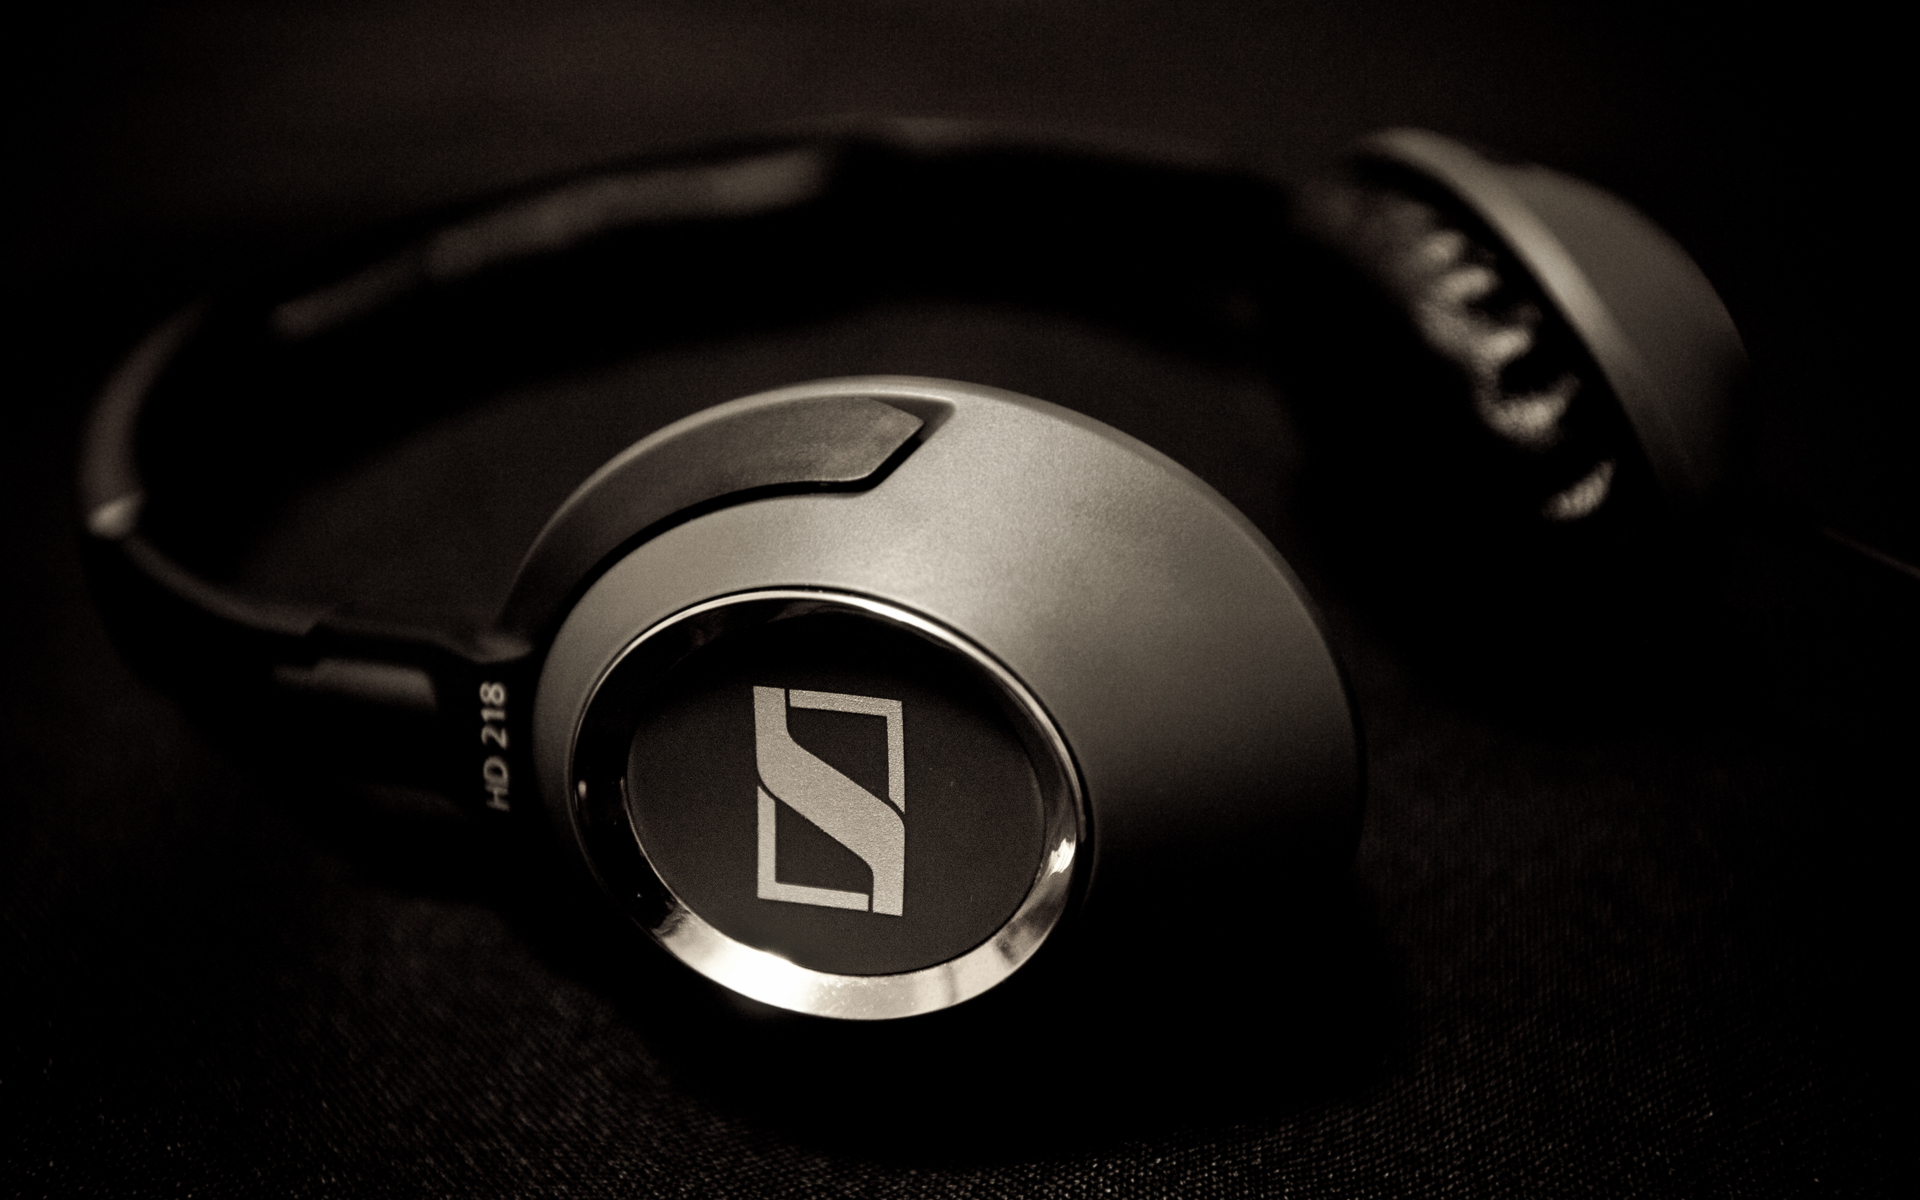 Komputer - Headphones And Ringtones (Elektrolad Remix)